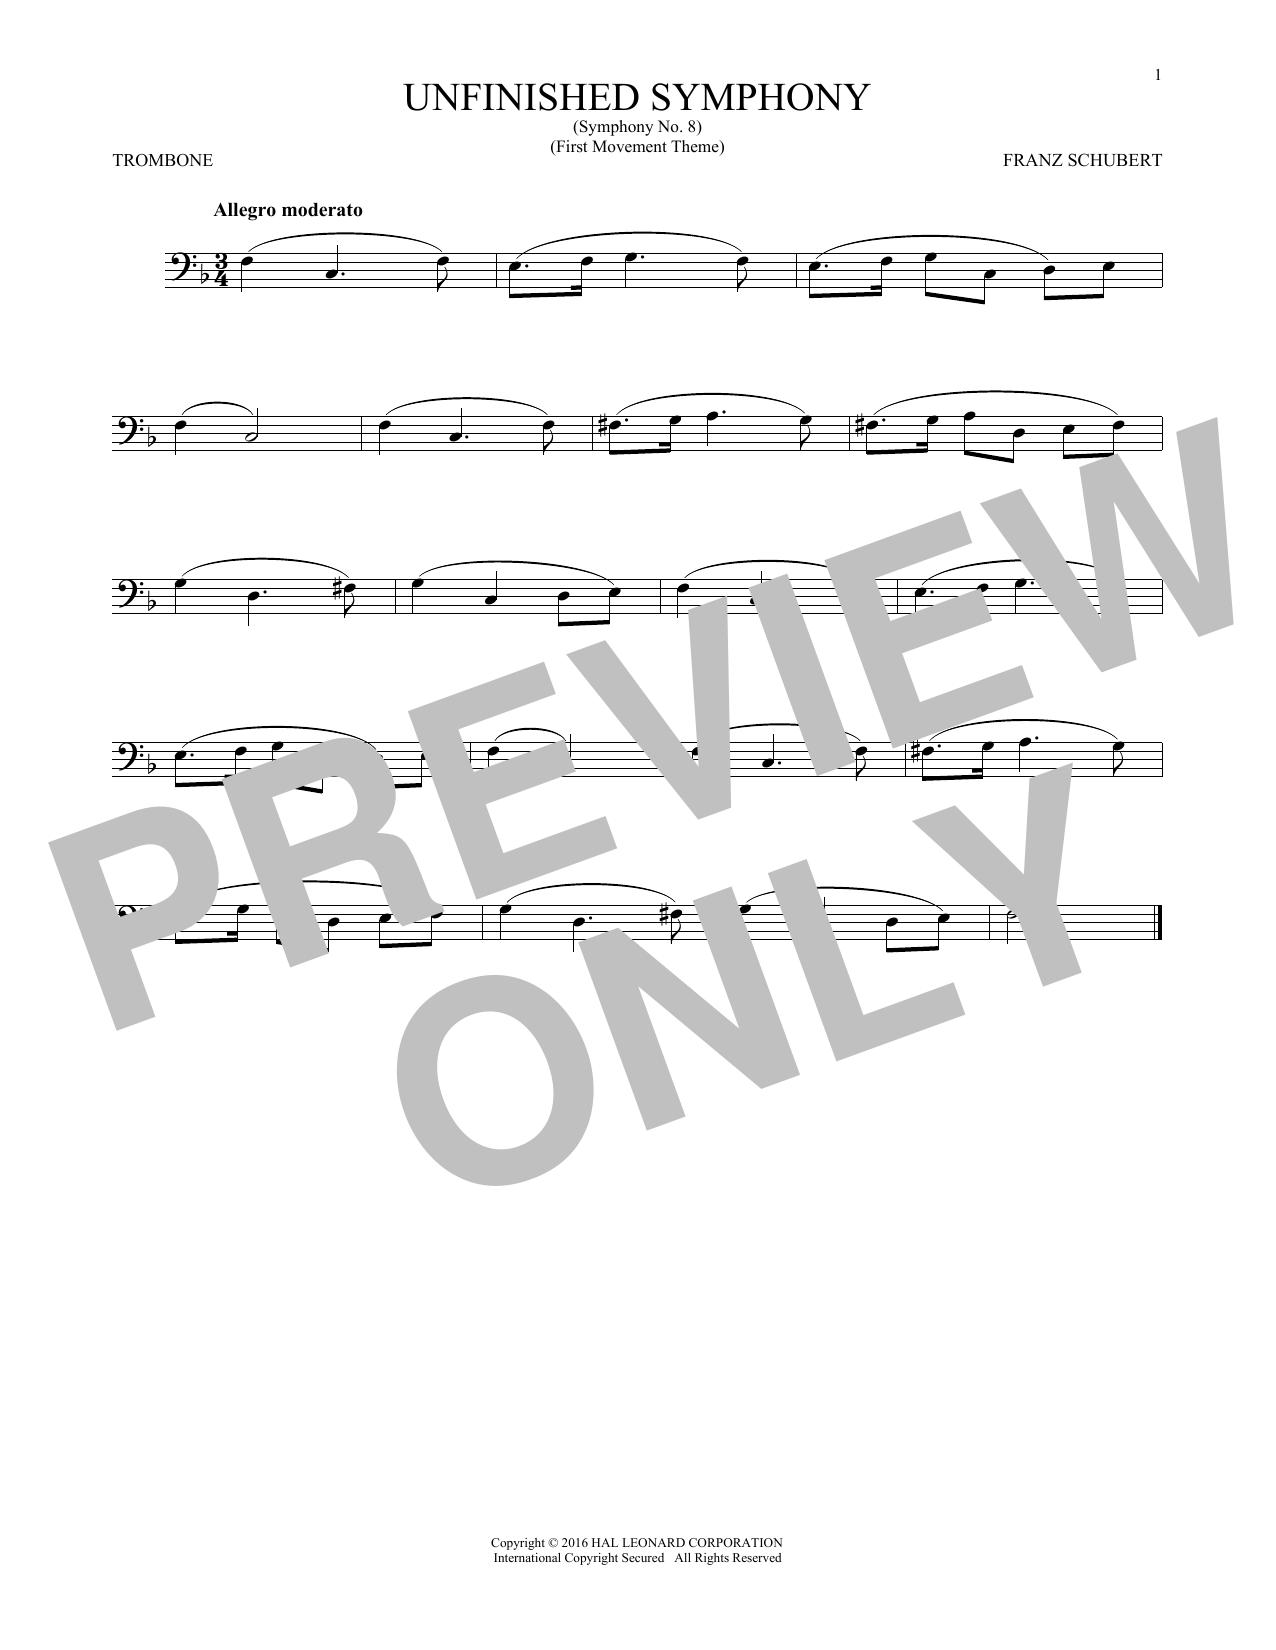 The Unfinished Symphony (Theme) (Trombone Solo)